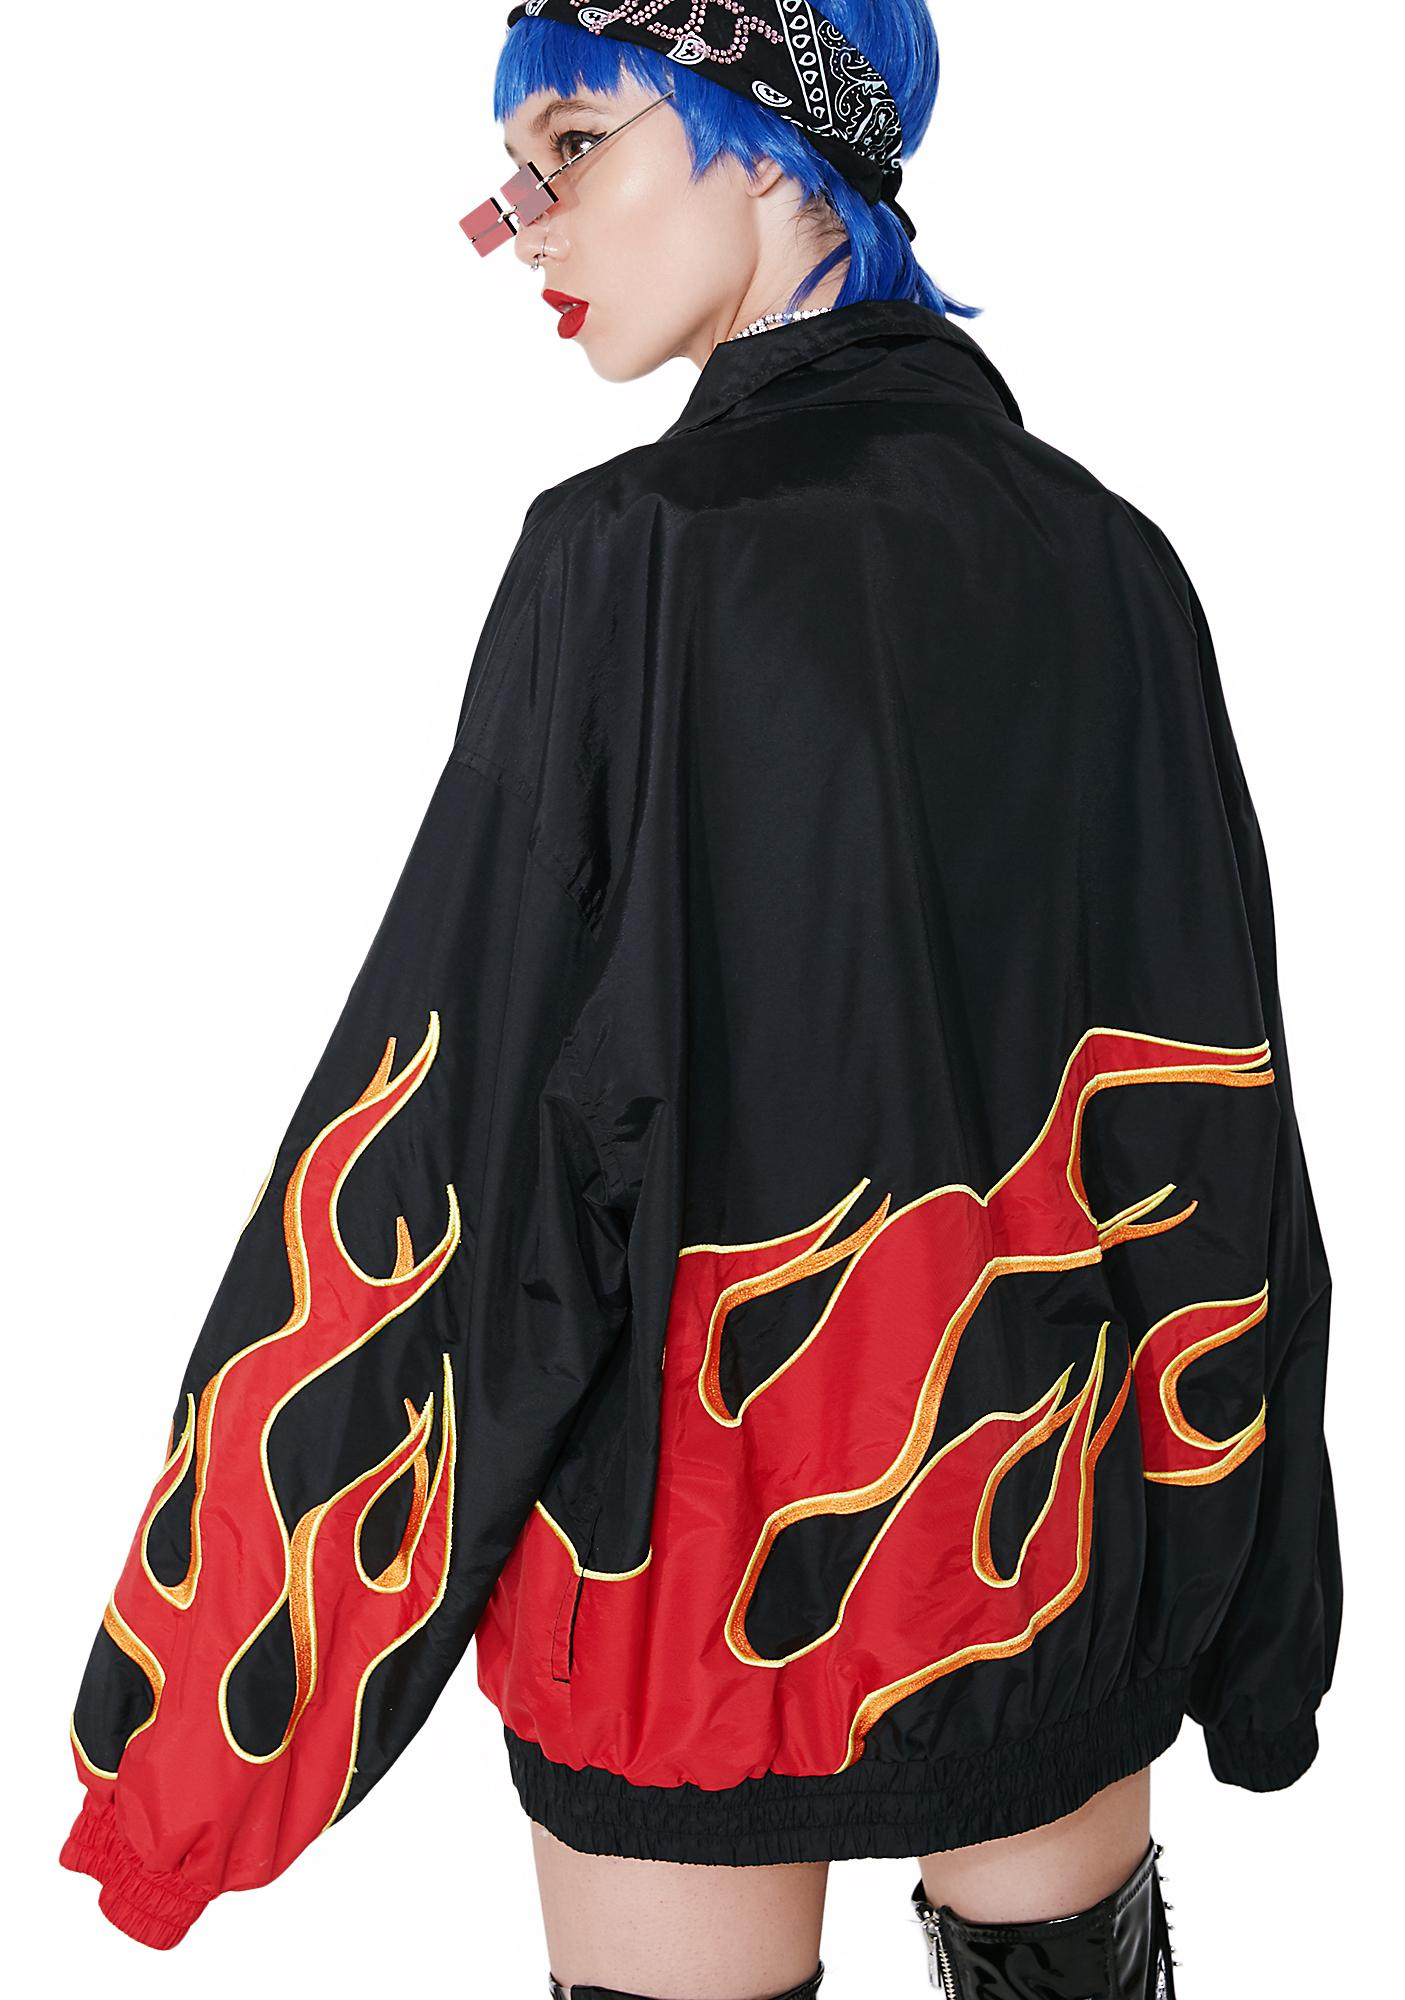 Vintage Flaming Dad Jacket